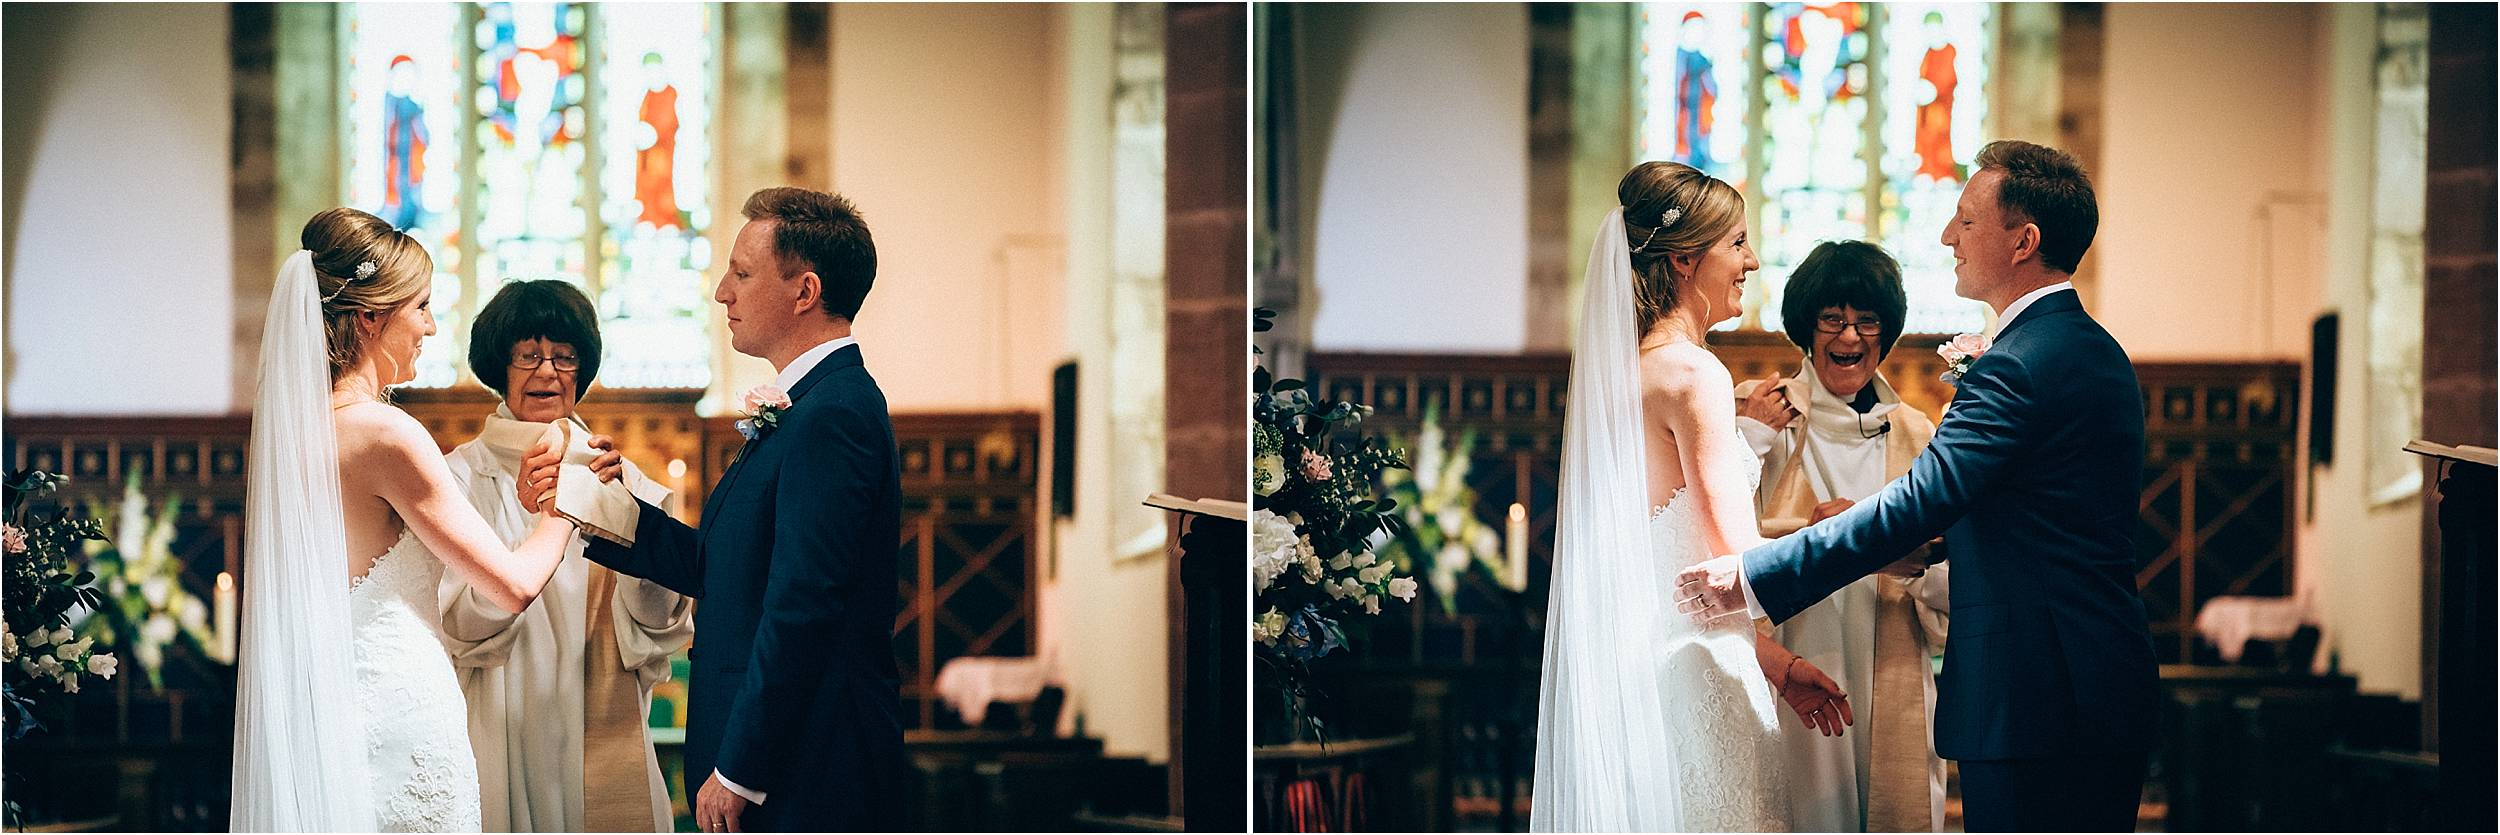 Herefordshire Wedding Photographer_0056.jpg